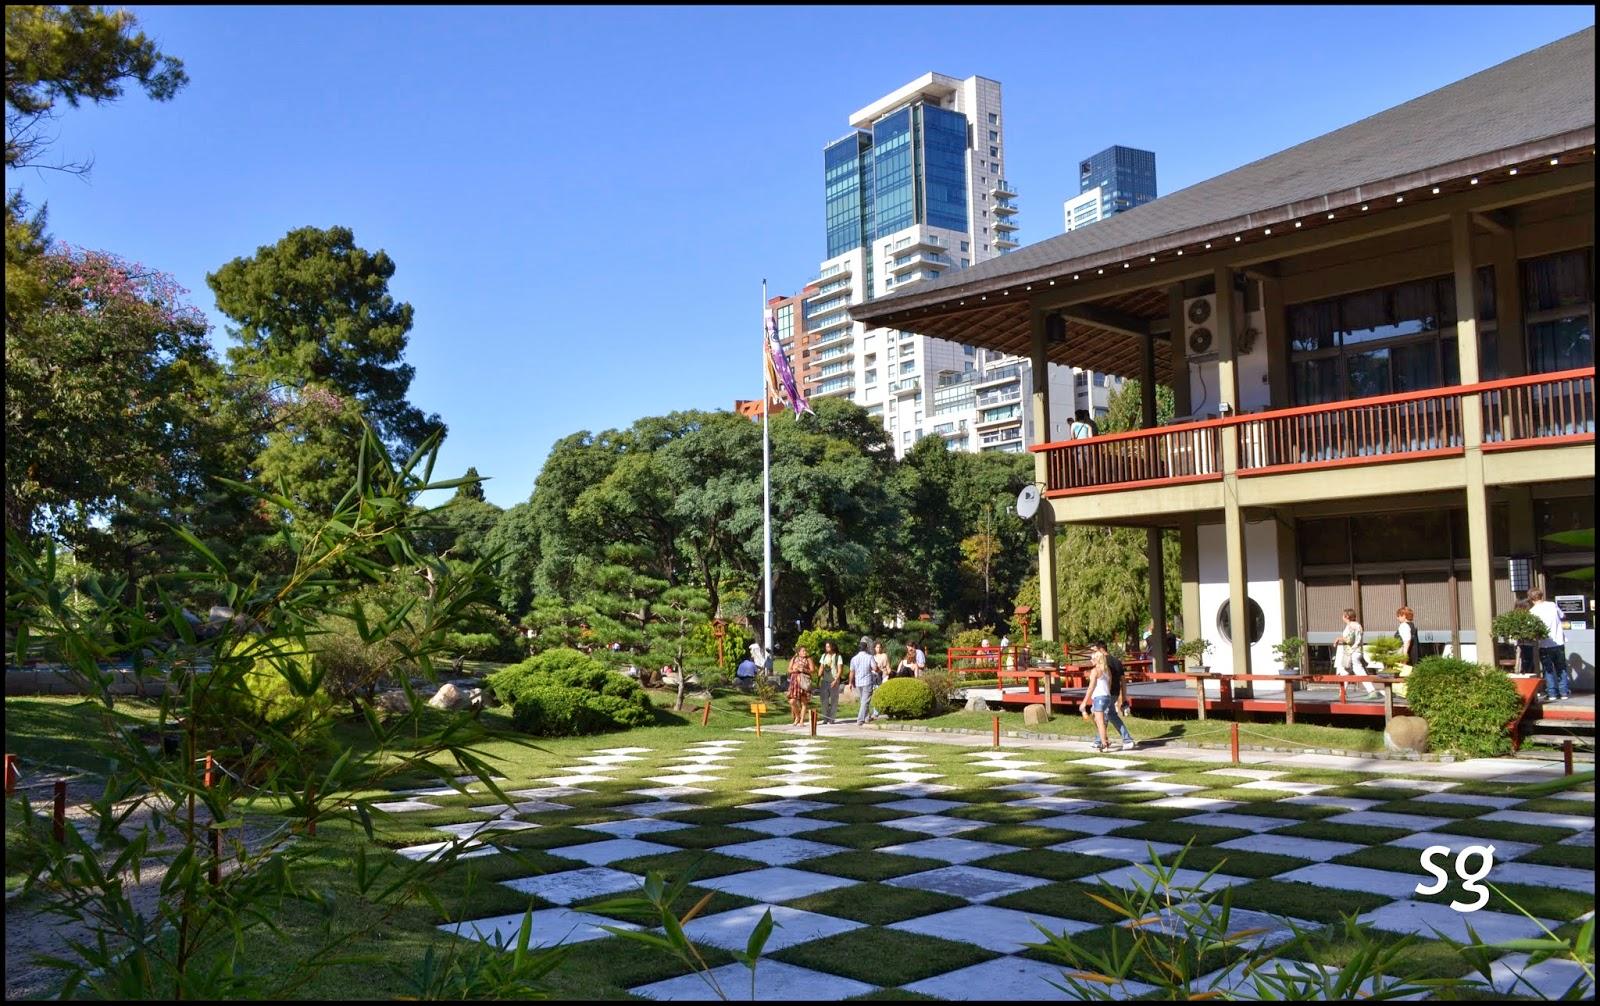 El rutero jard n japones for Jardin japones